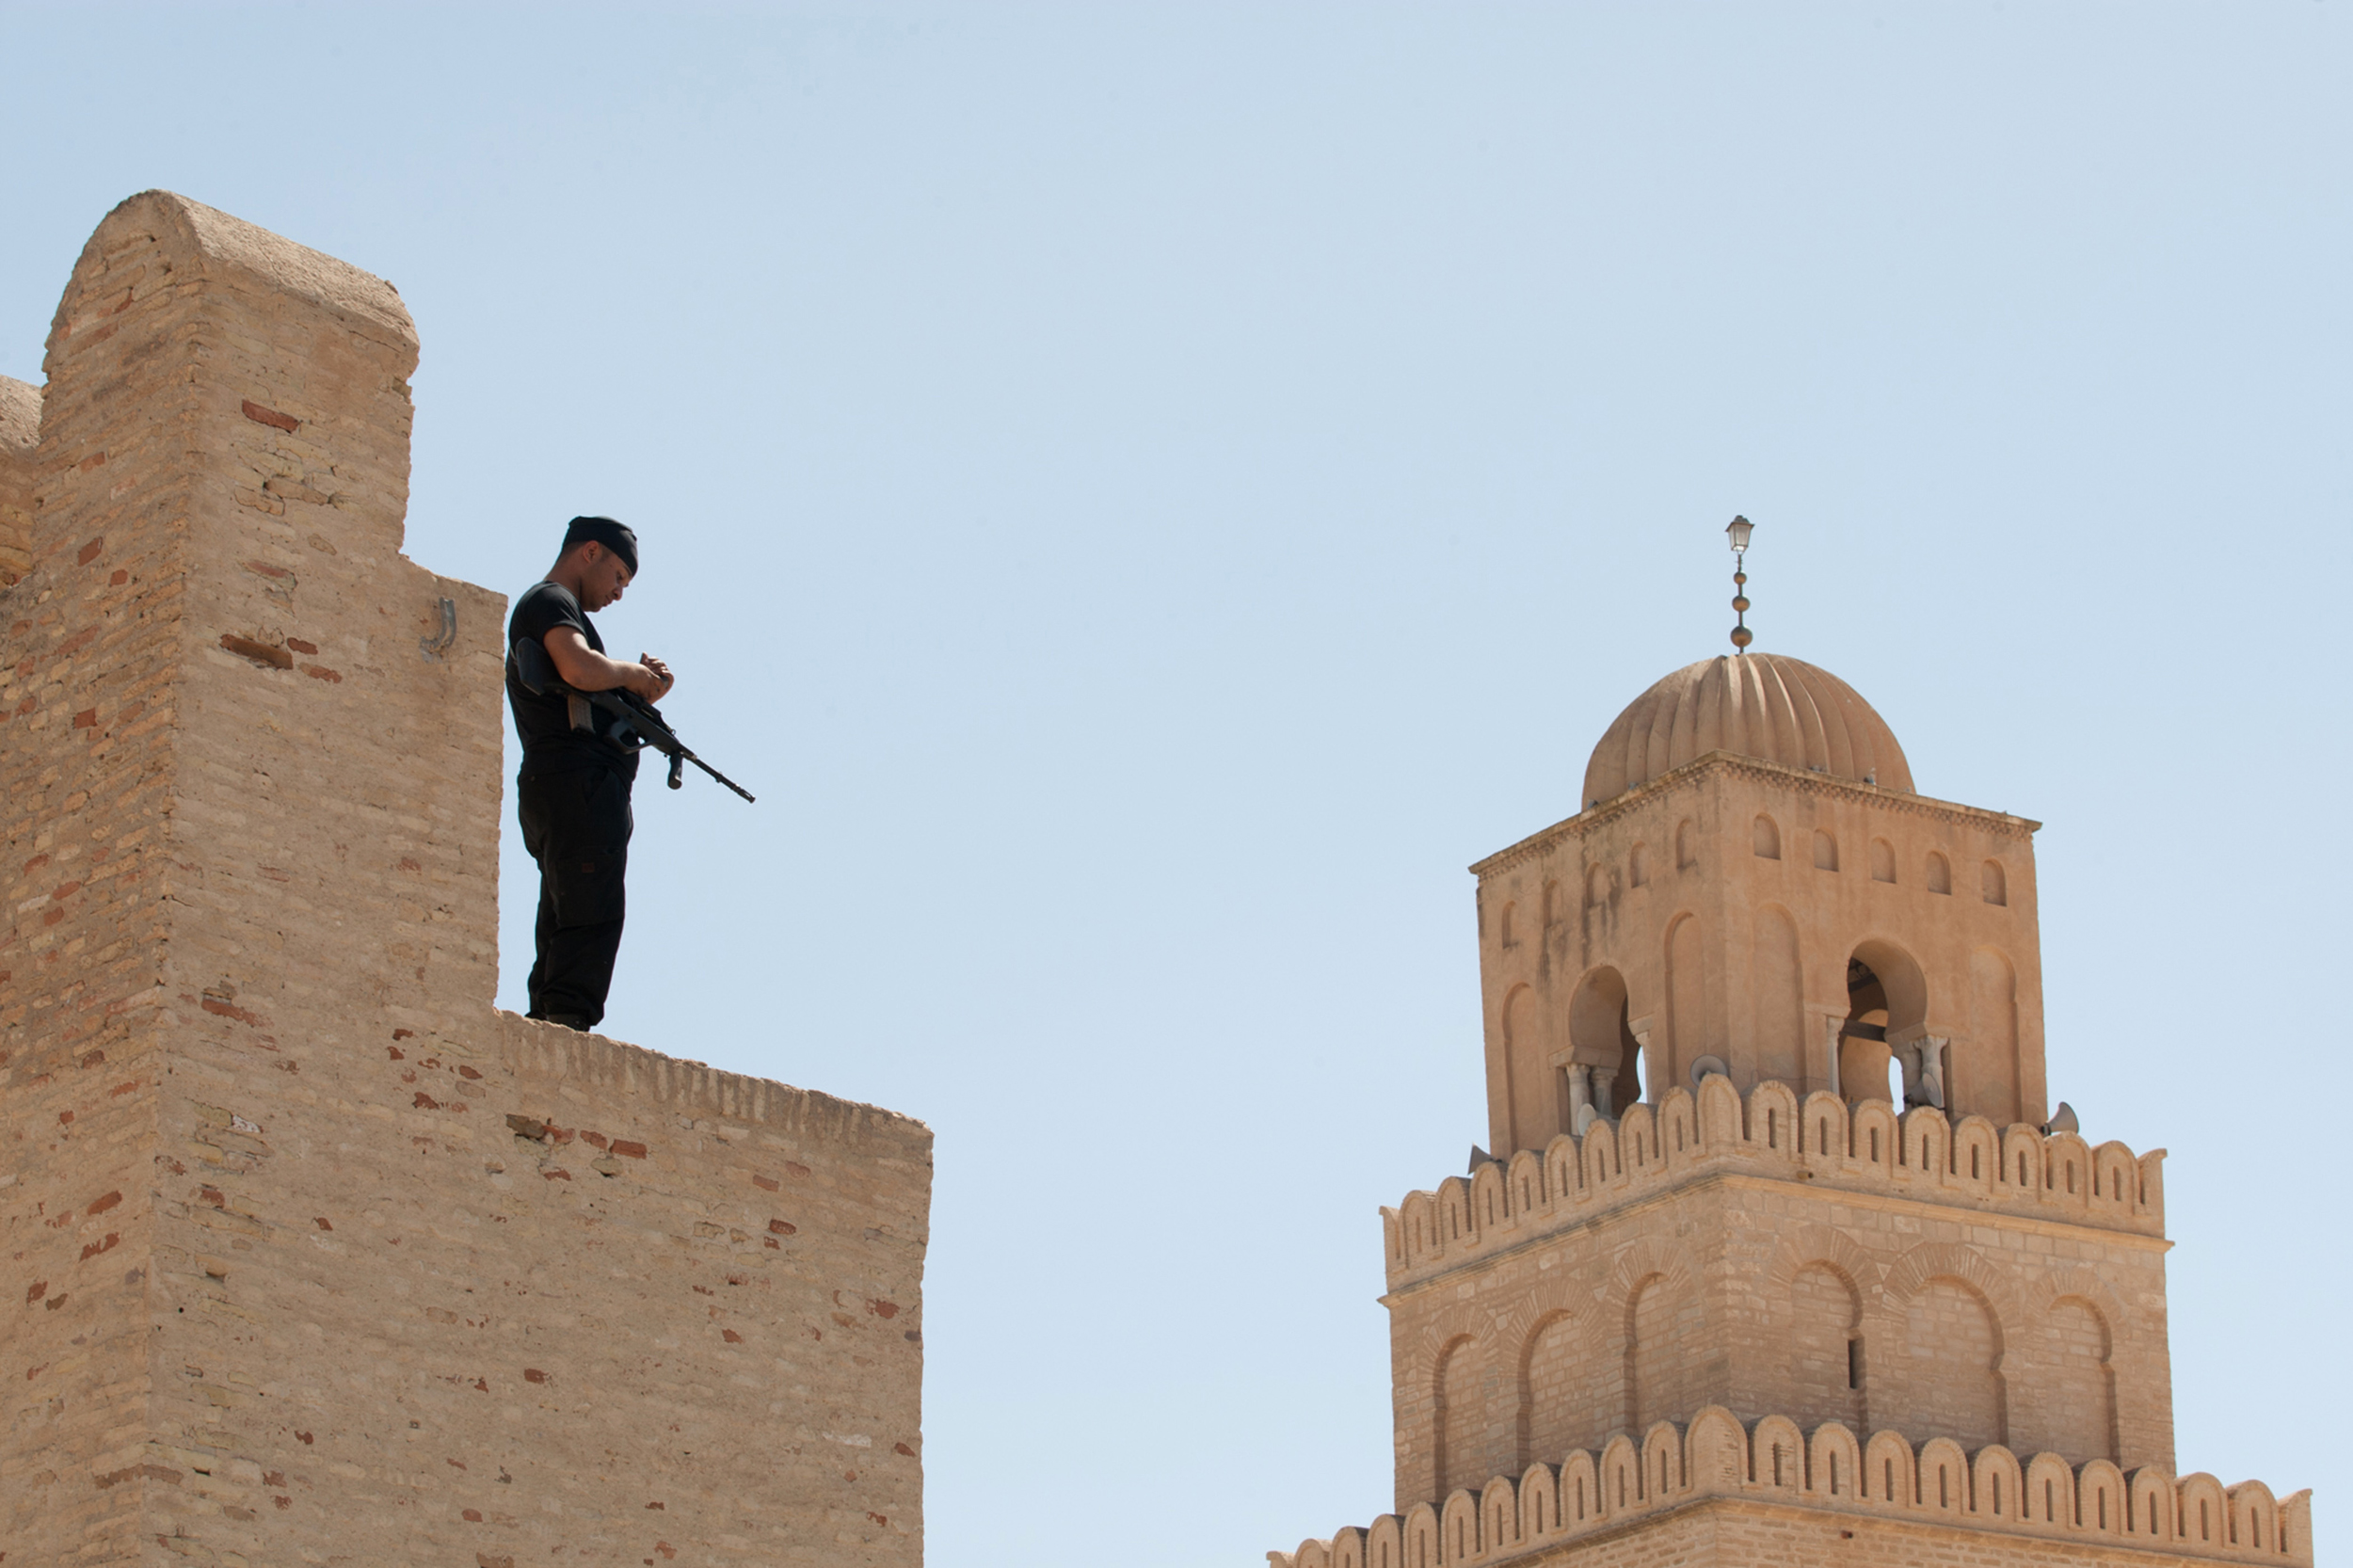 Making of a Terrorist: How Tunisia Gunman Became Radicalized